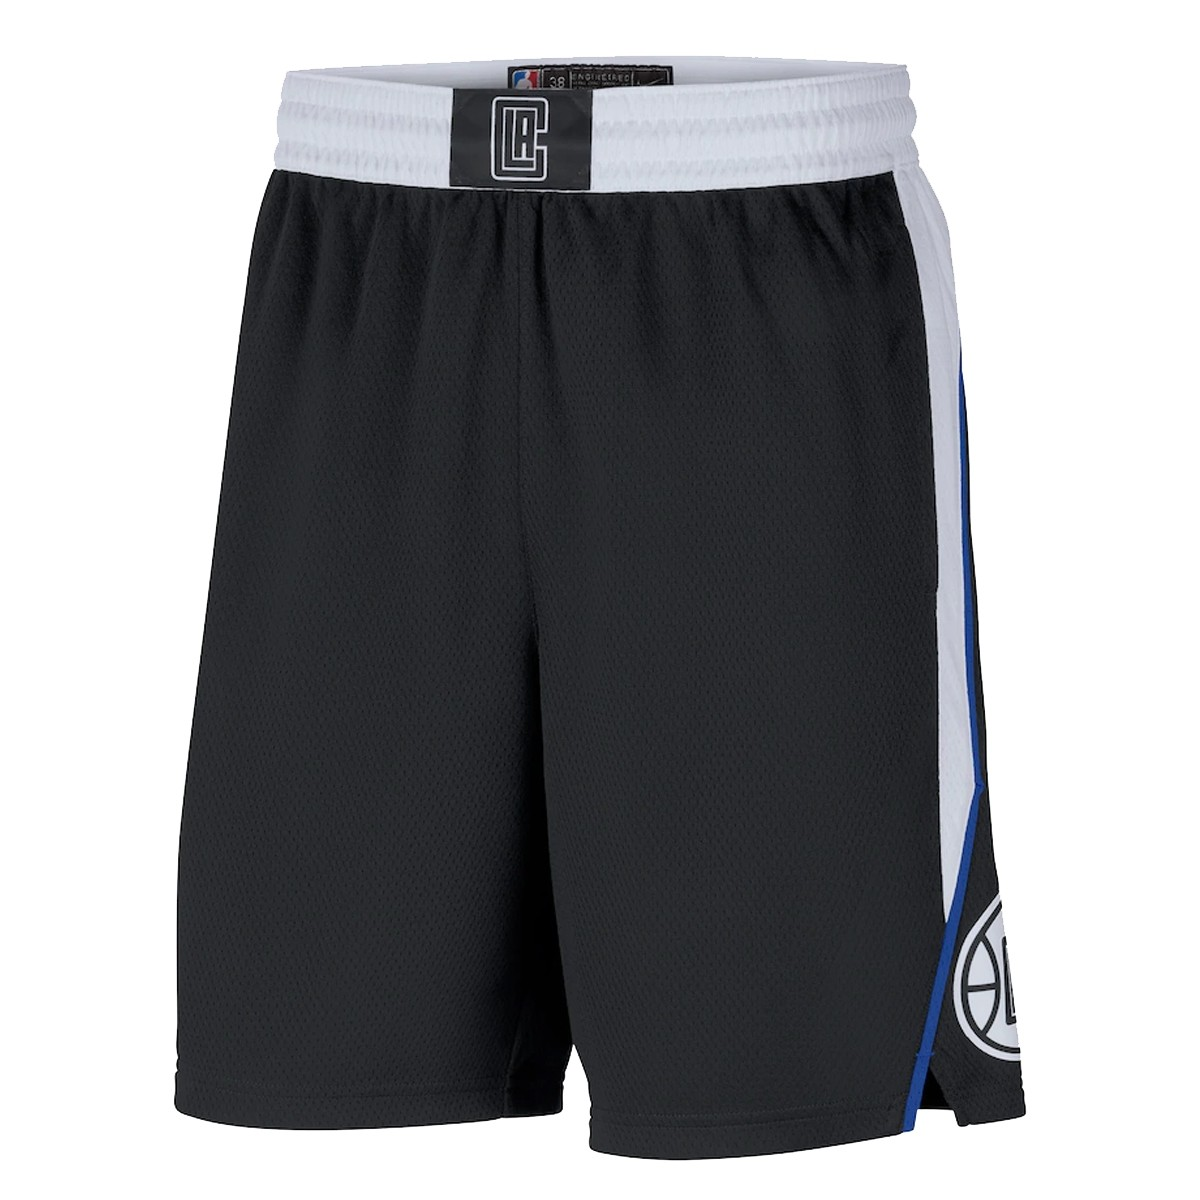 Nike Jr NBA Los Angeles Clippers Swingman Short 'City Edition'